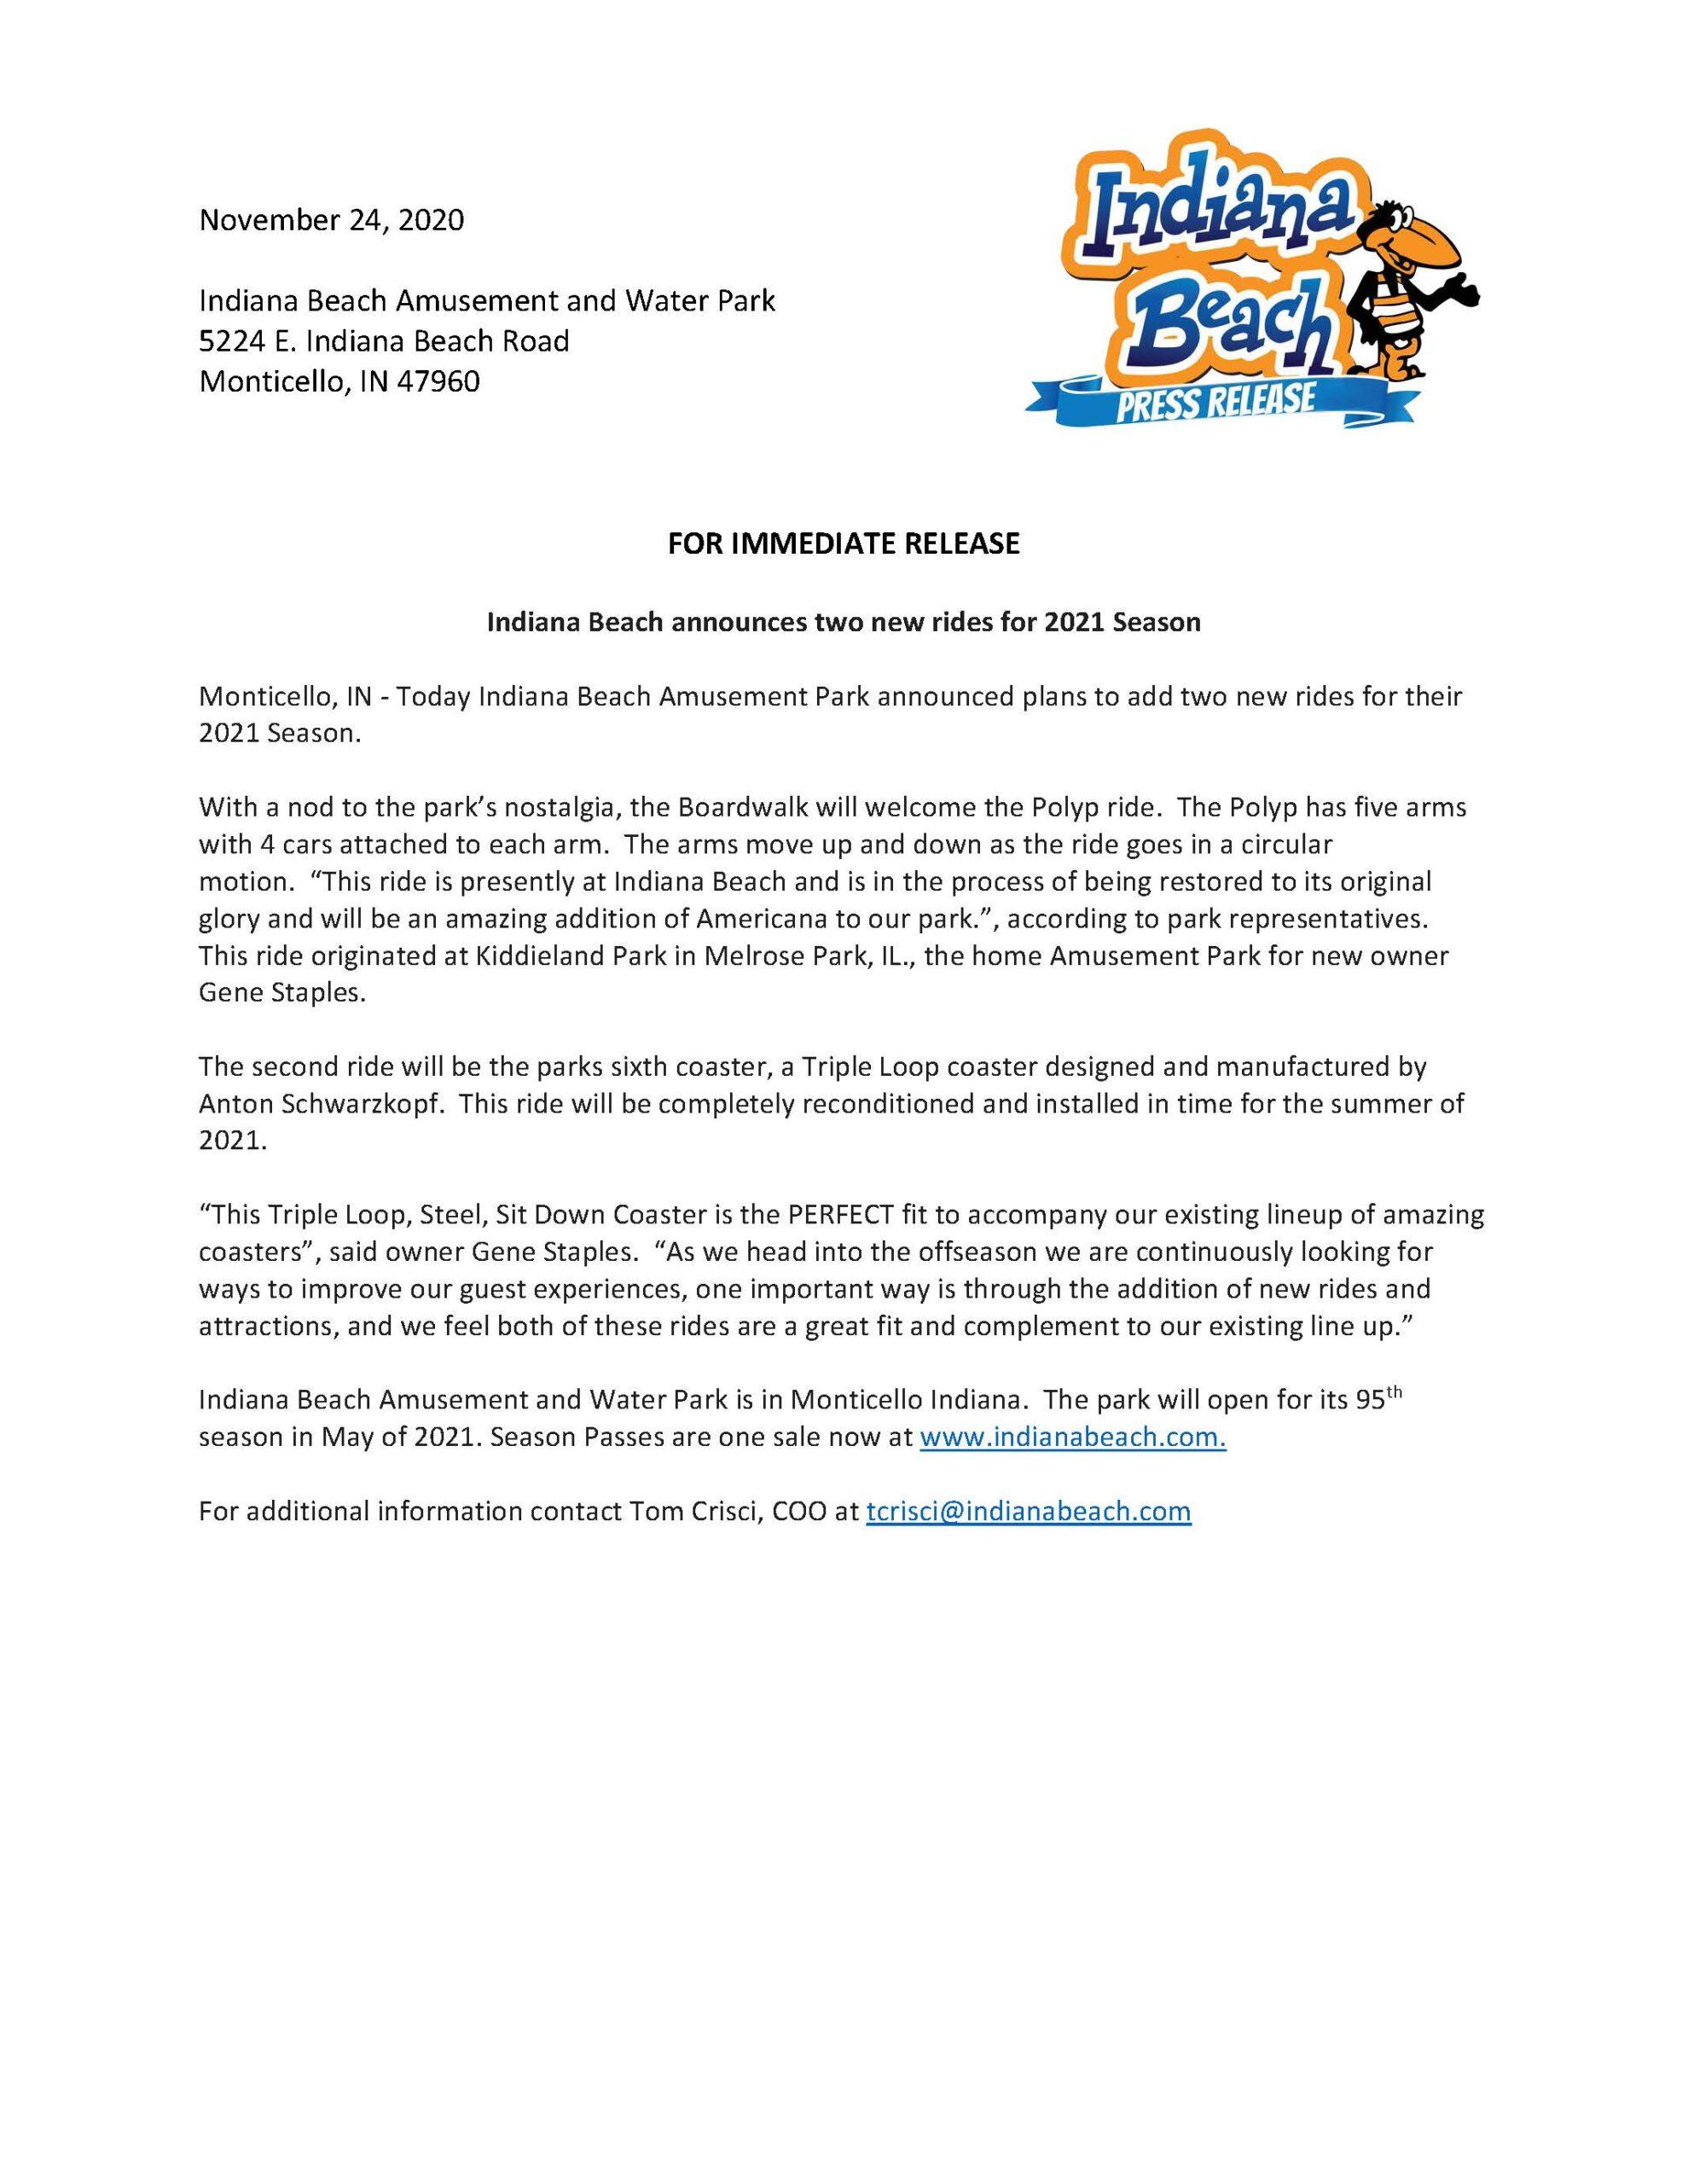 November-24th-Press-Release-scaled.jpg